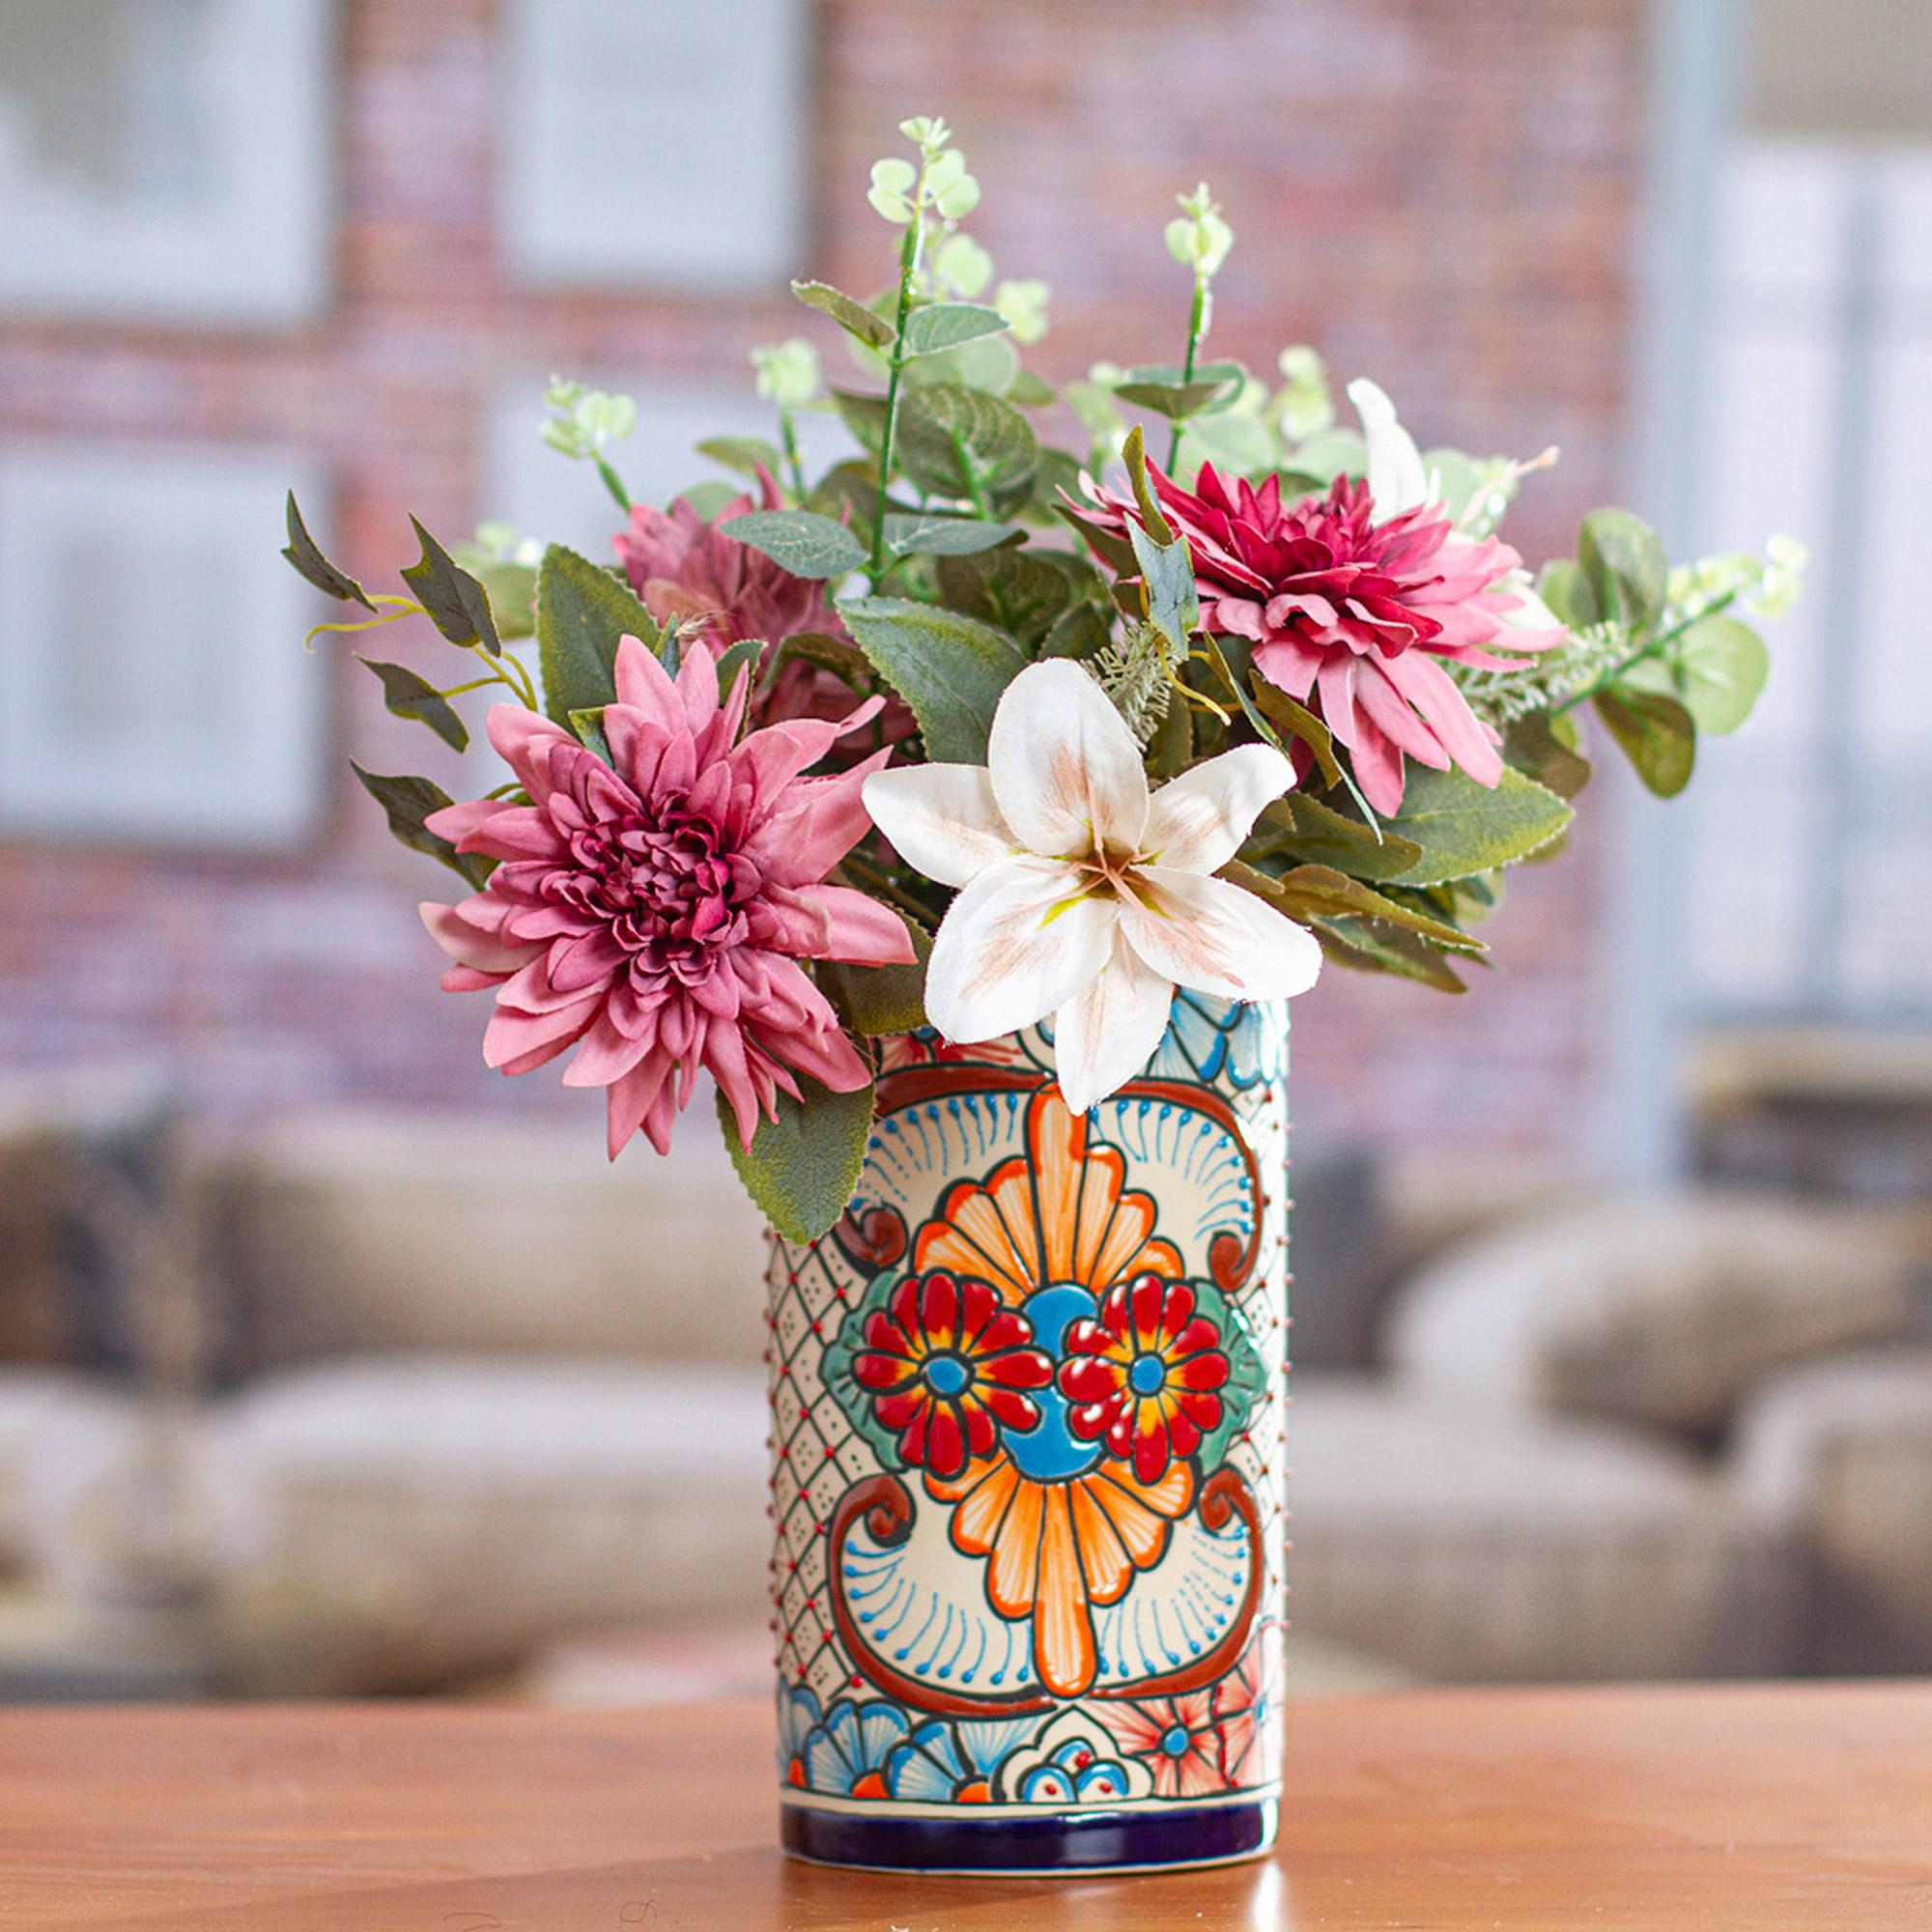 Talavera Style Blue Rim Colorful Floral Motif Ceramic Vase Garden Gift Novica